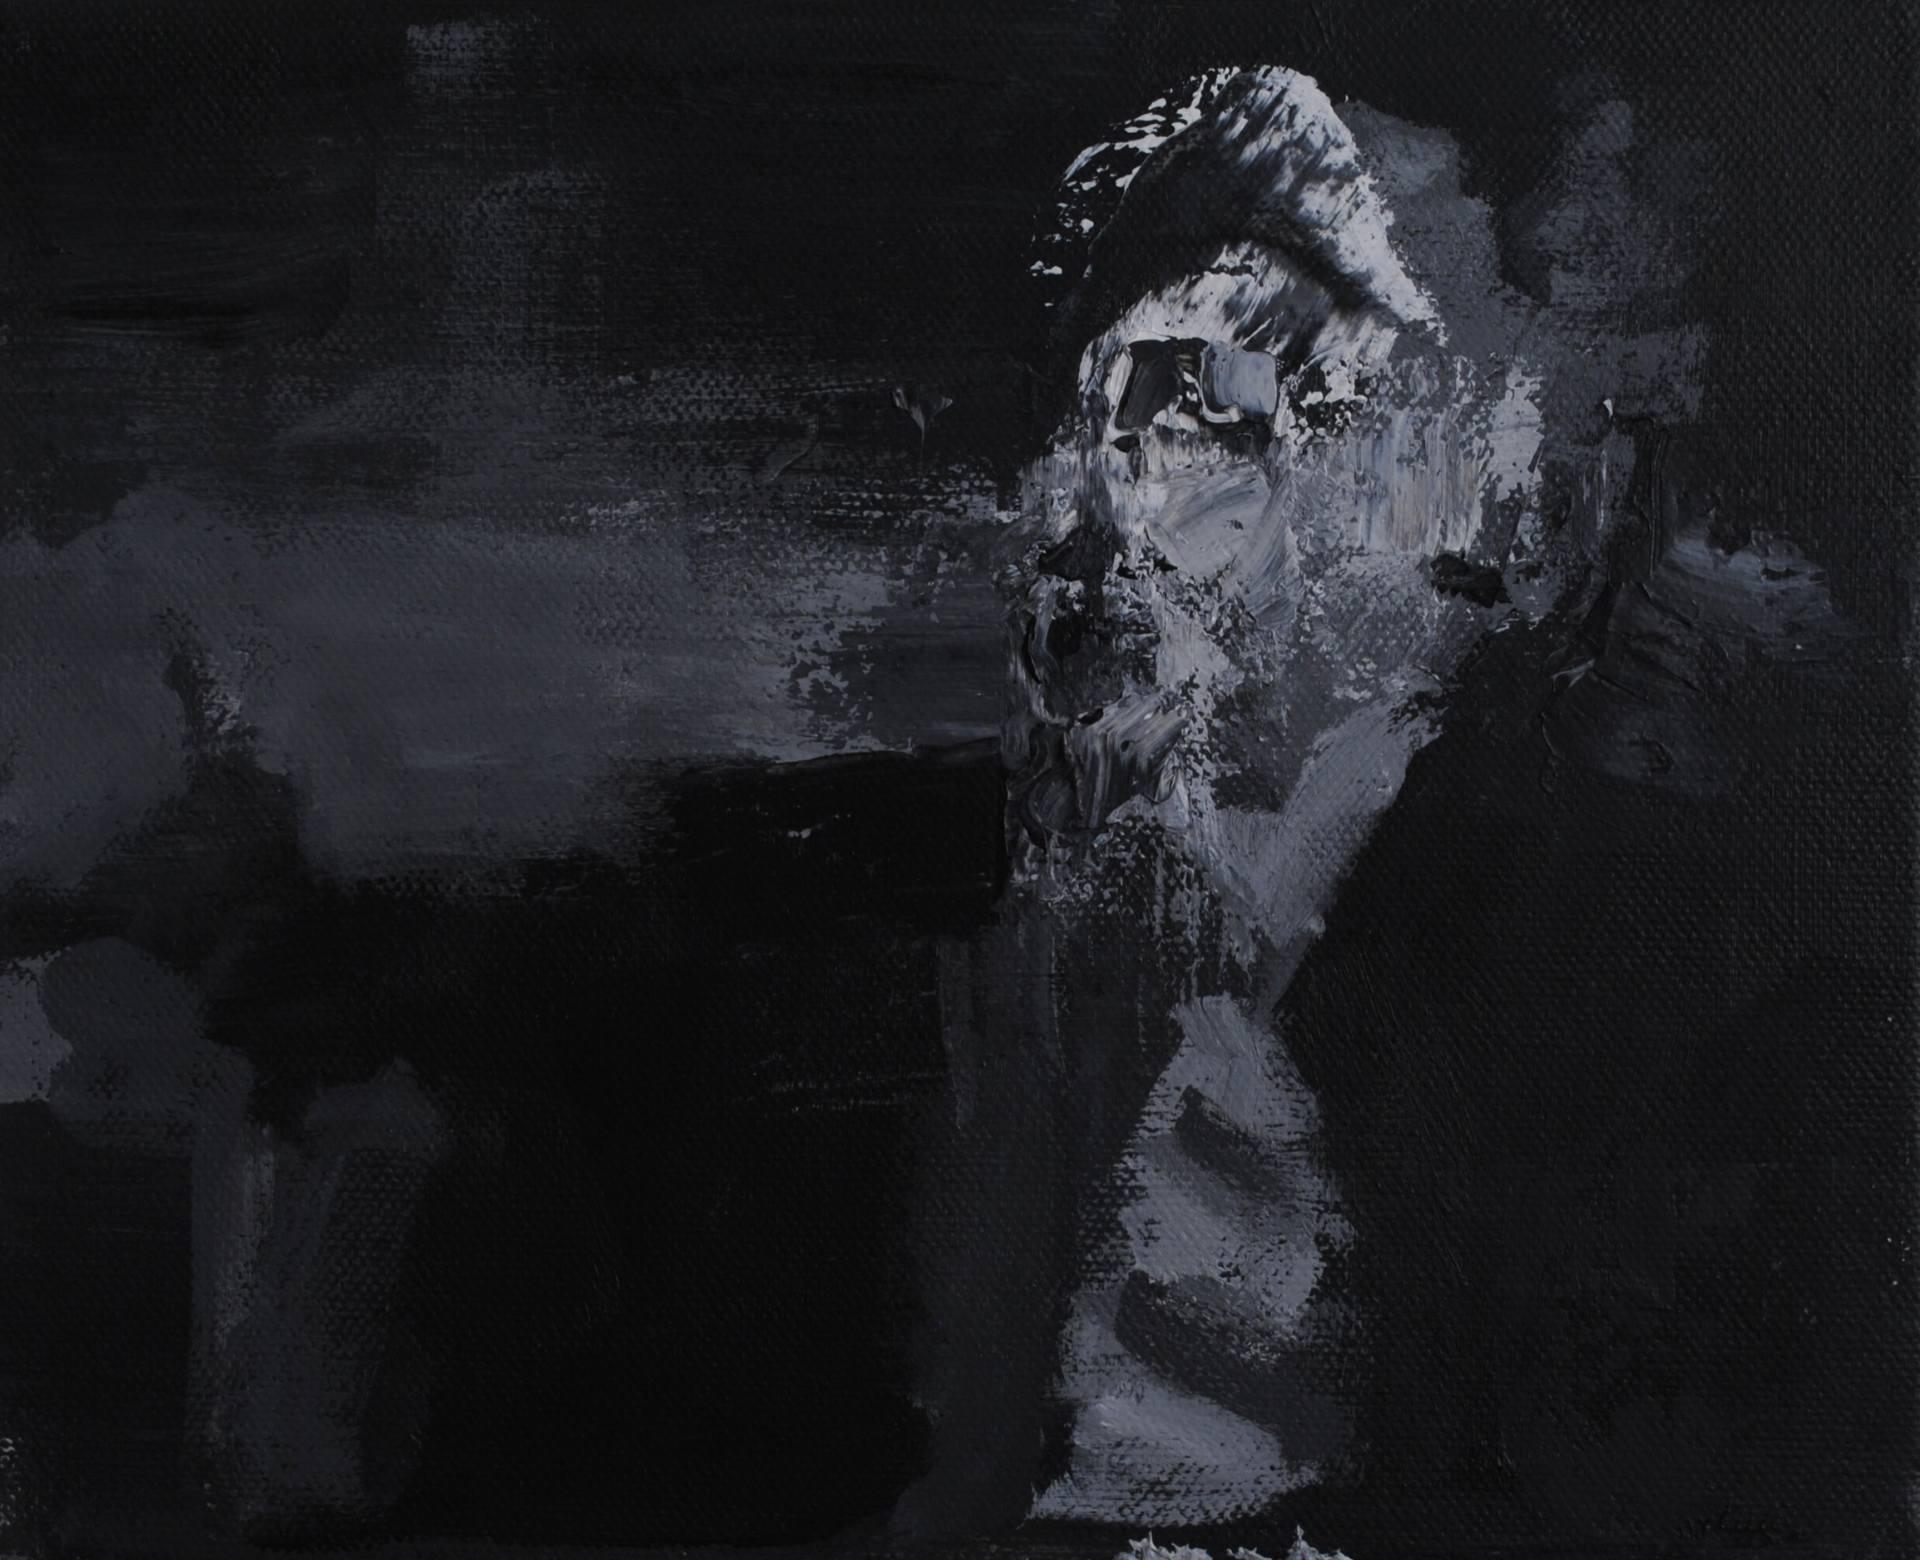 Trotsky 3, by Jean-Luc Almond